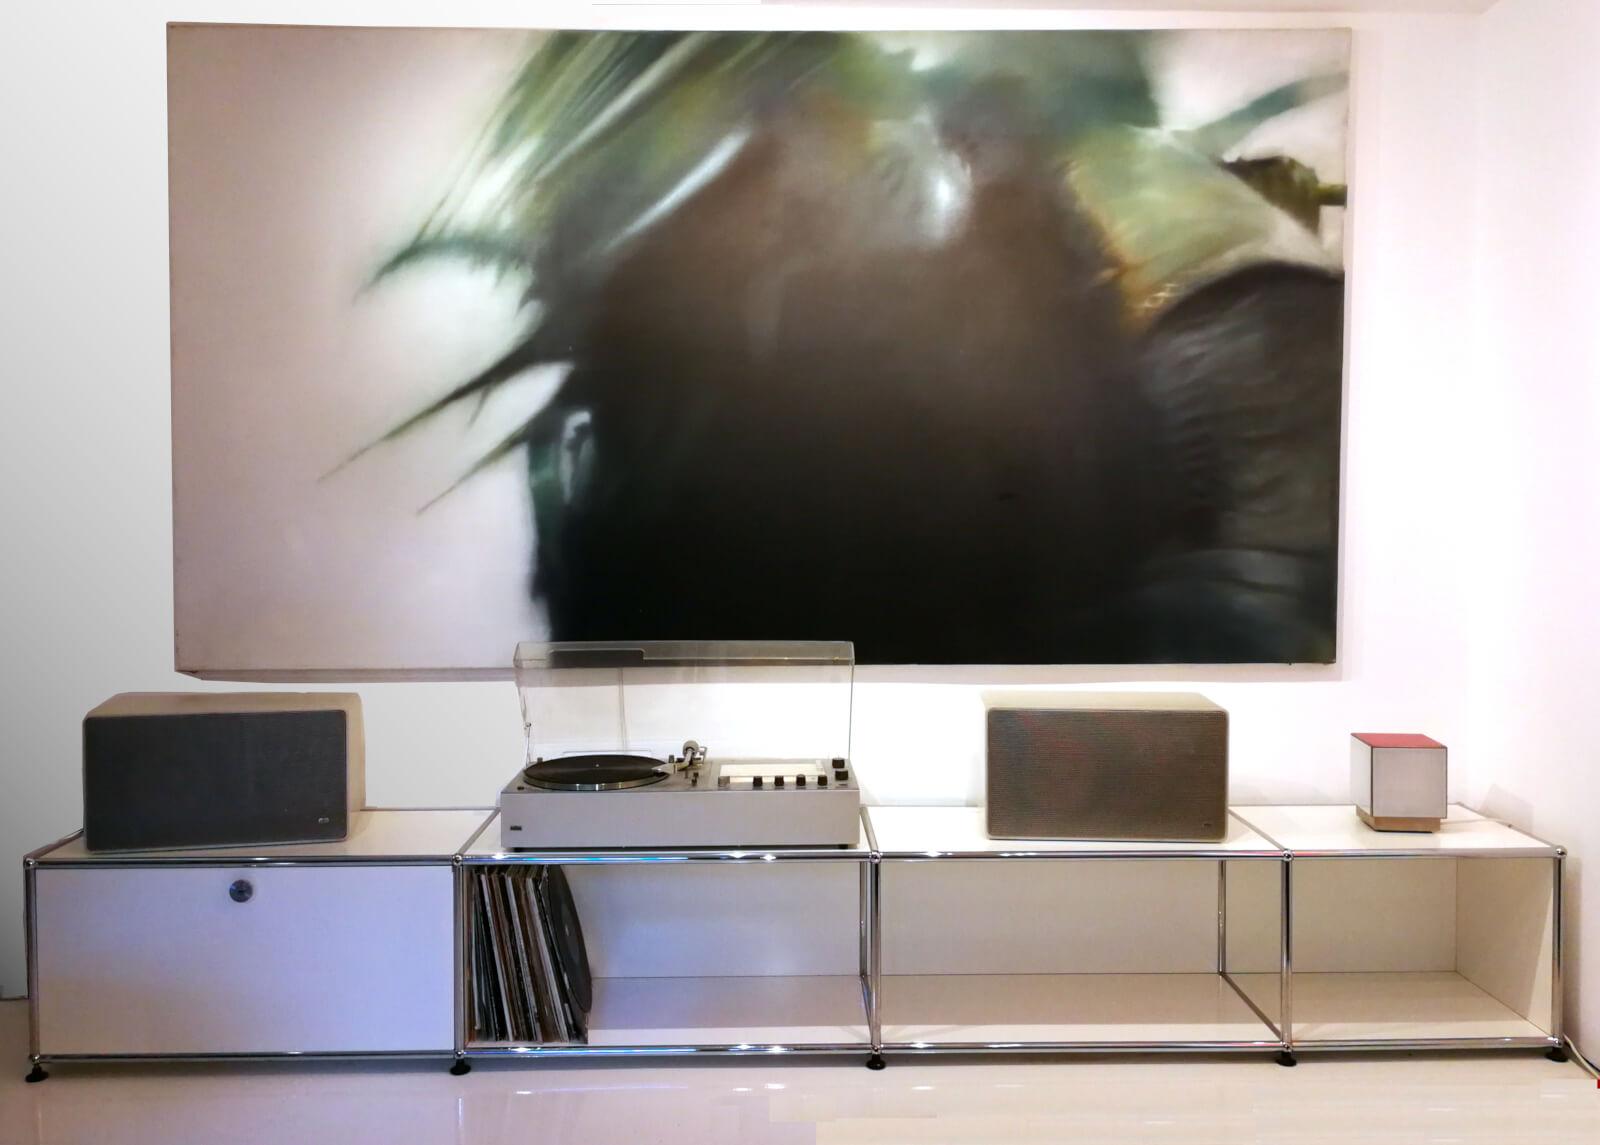 Braun Audio 310 & L625 & USM Mediaboard & Artwork Kaluza